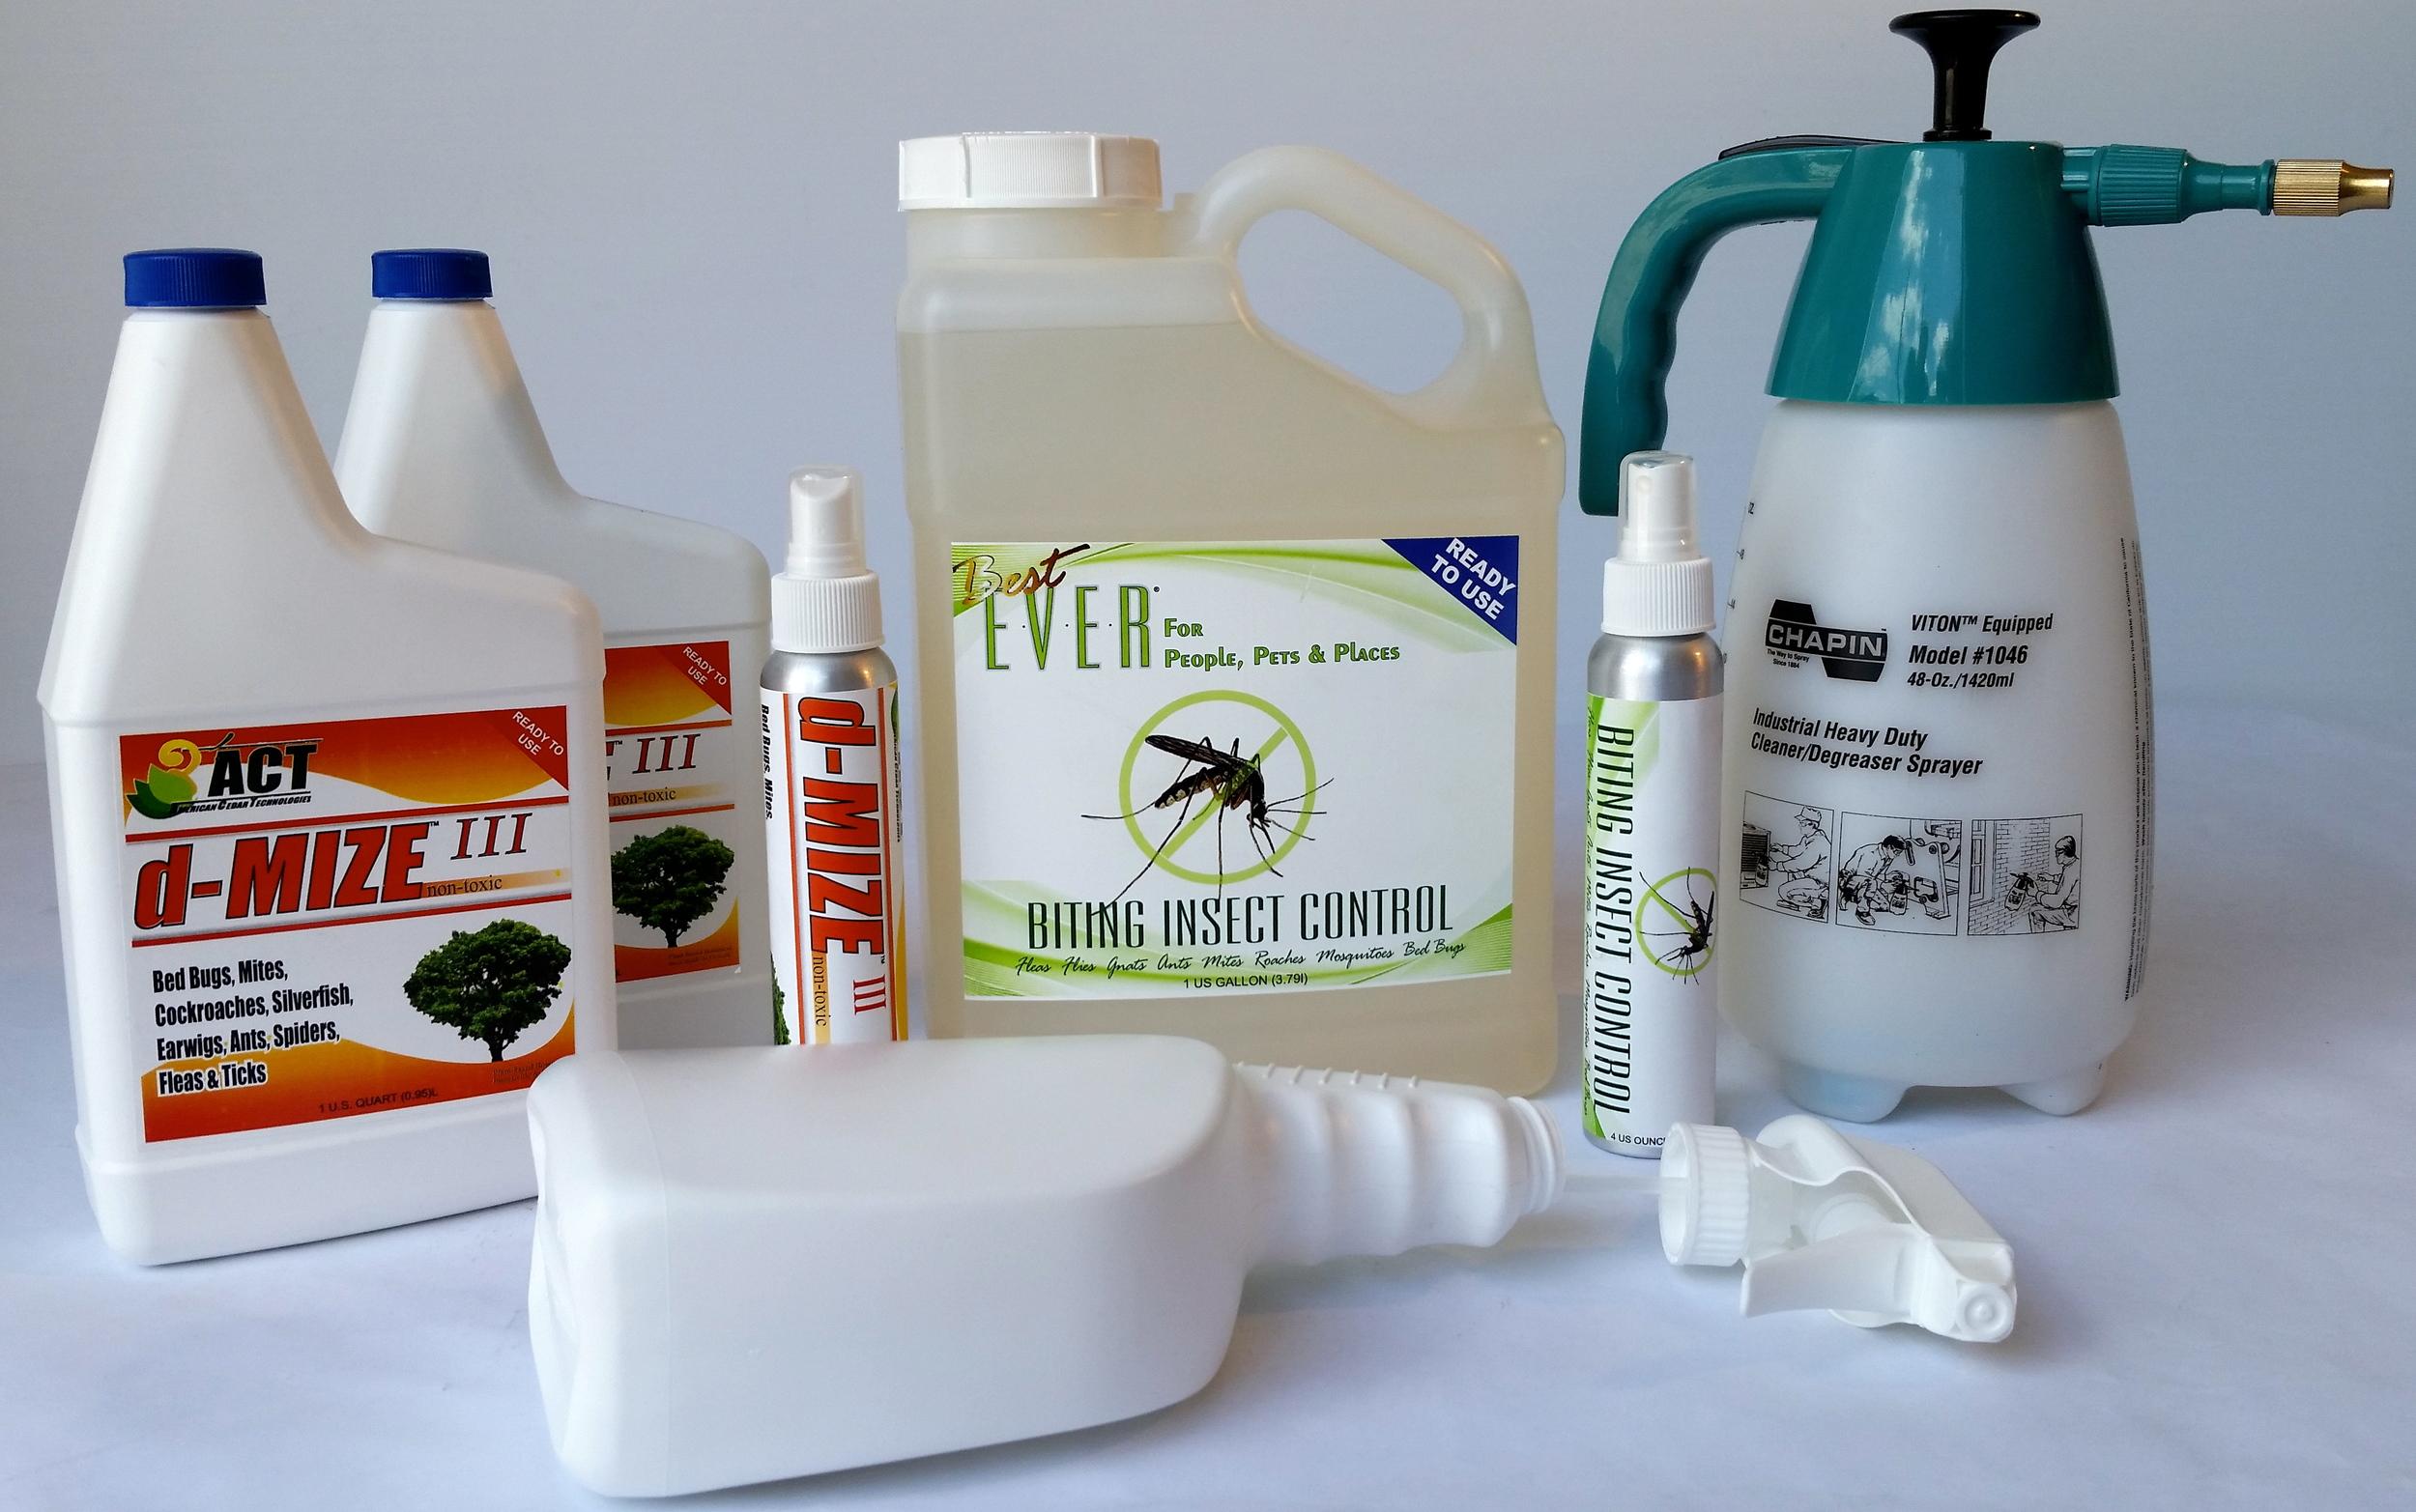 DIY Apartment Bed Bug Treatment Kit —